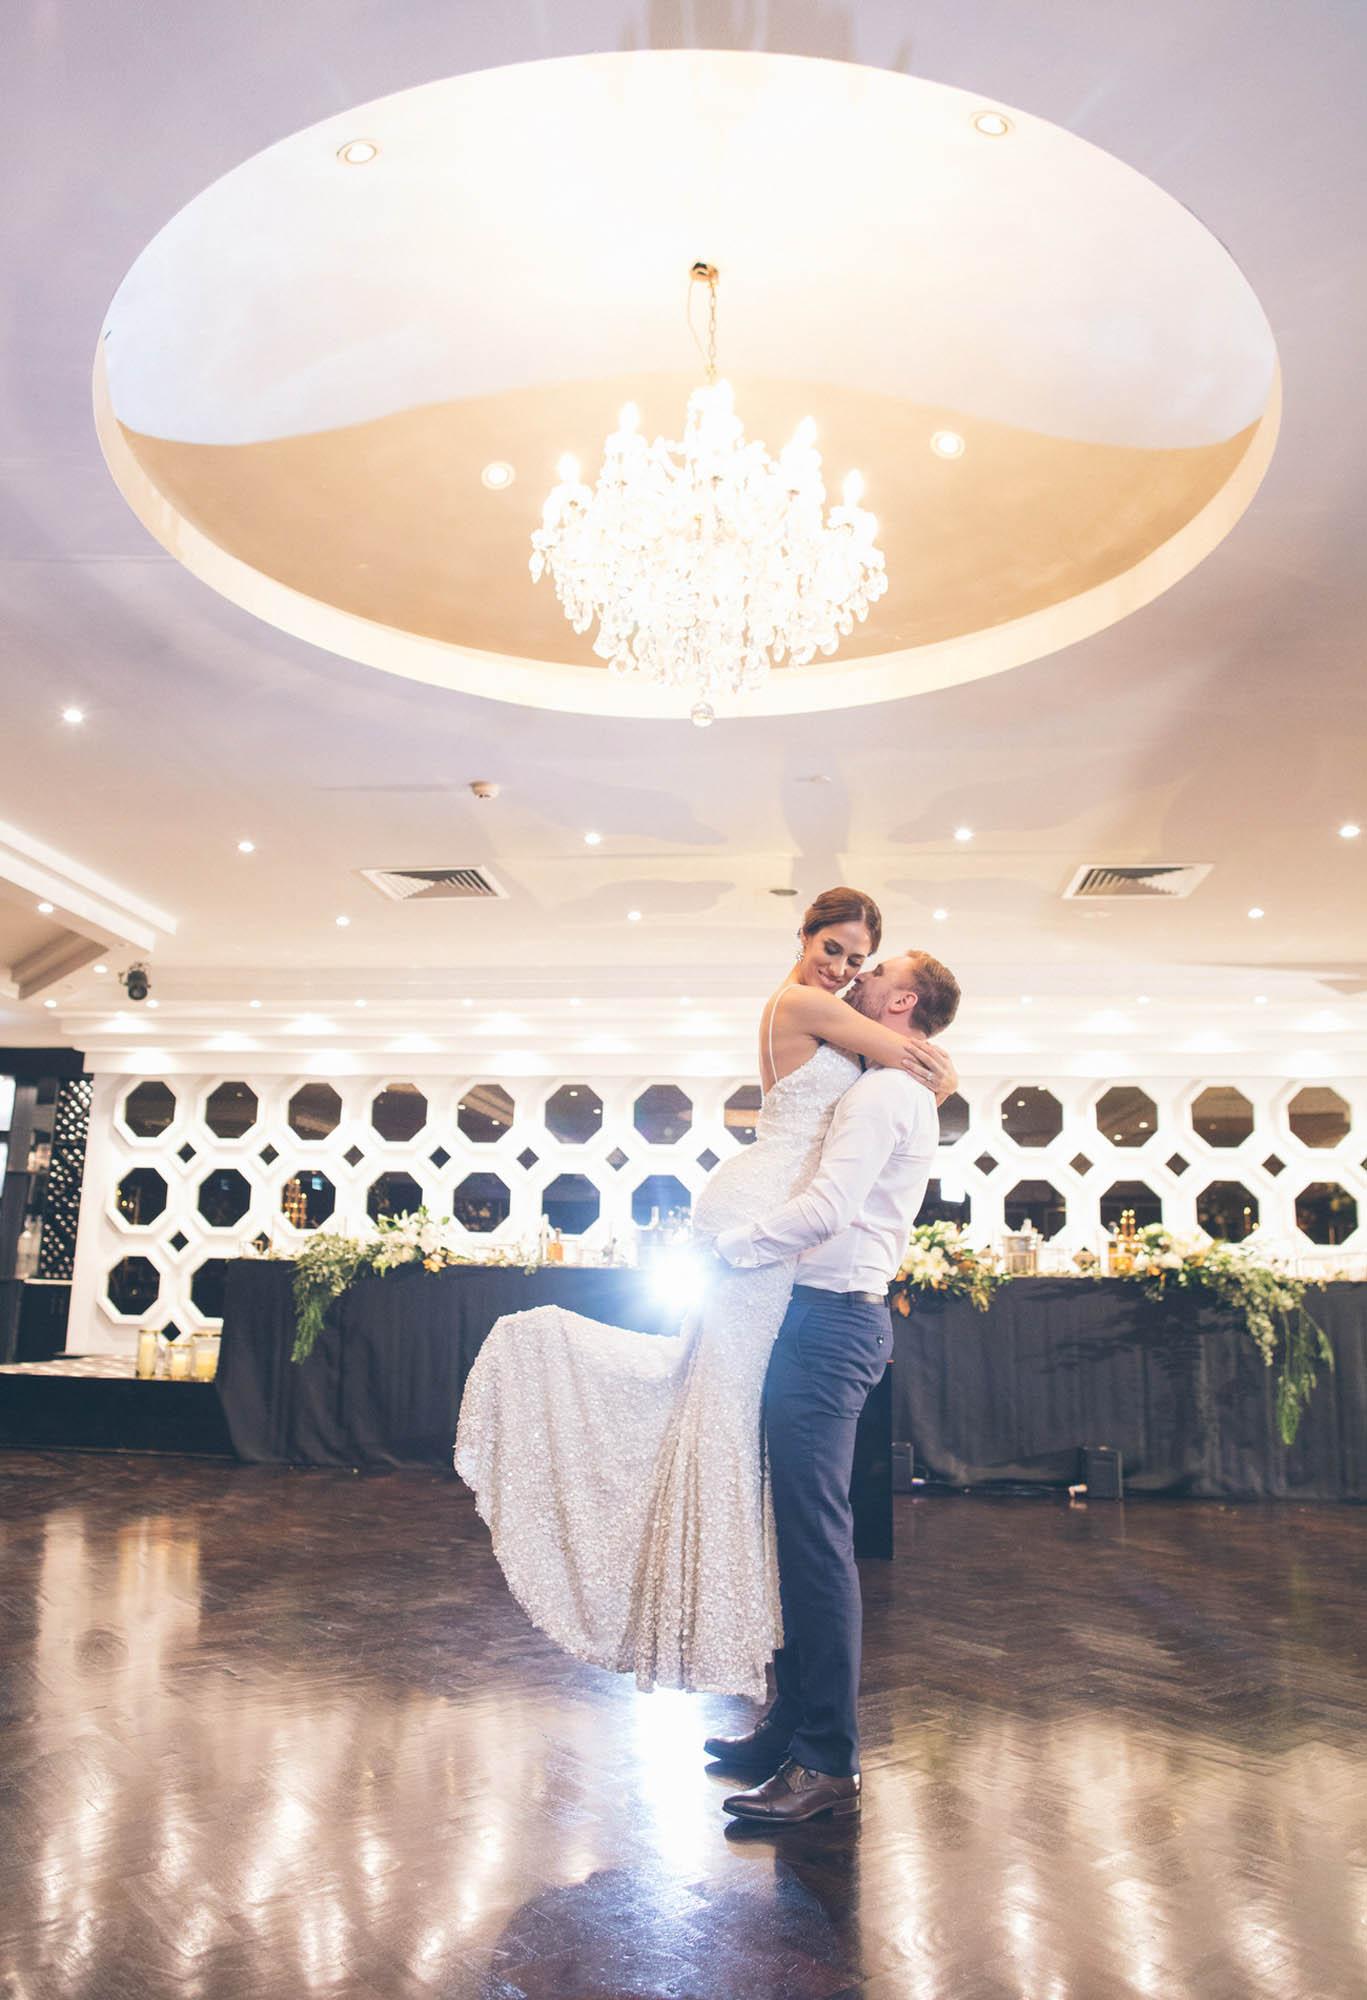 MacDougall-Photography-Sydney-Wedding-Photographers-90.jpg